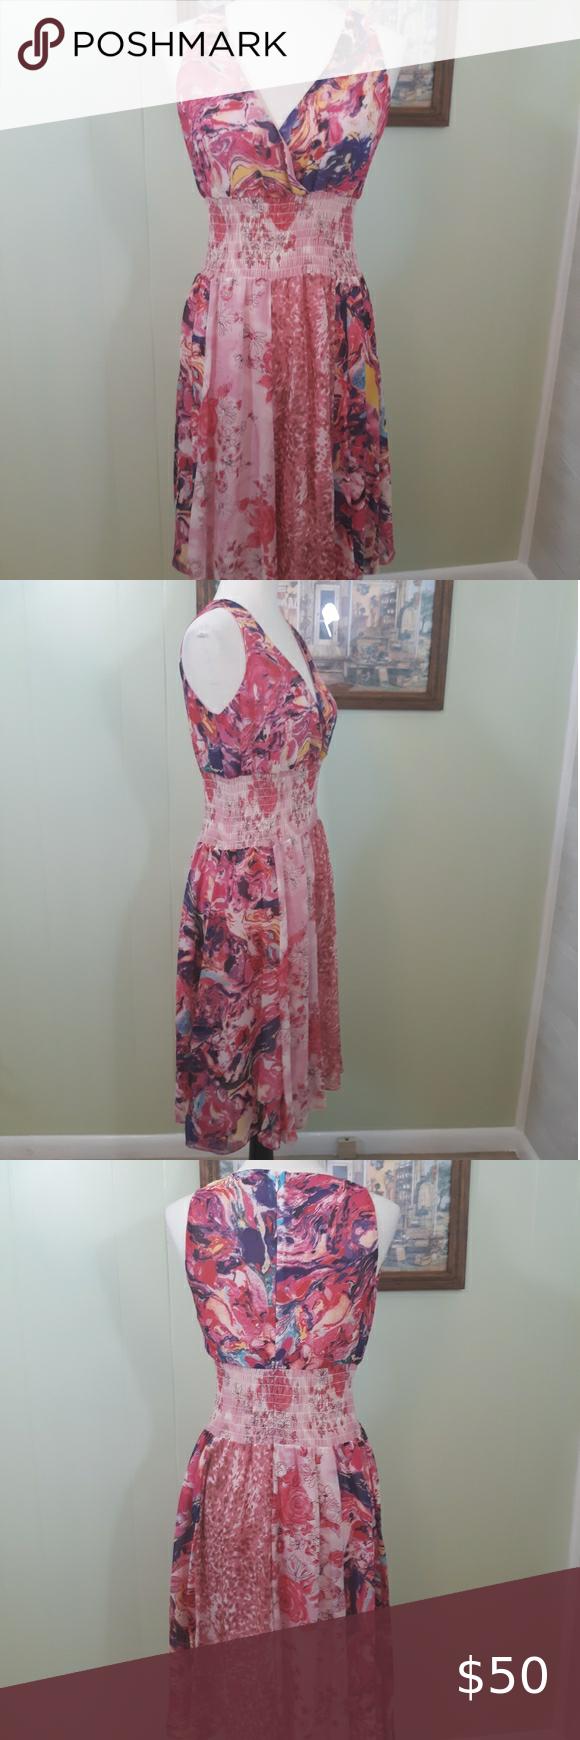 30+ Chetta b silk dress ideas in 2021